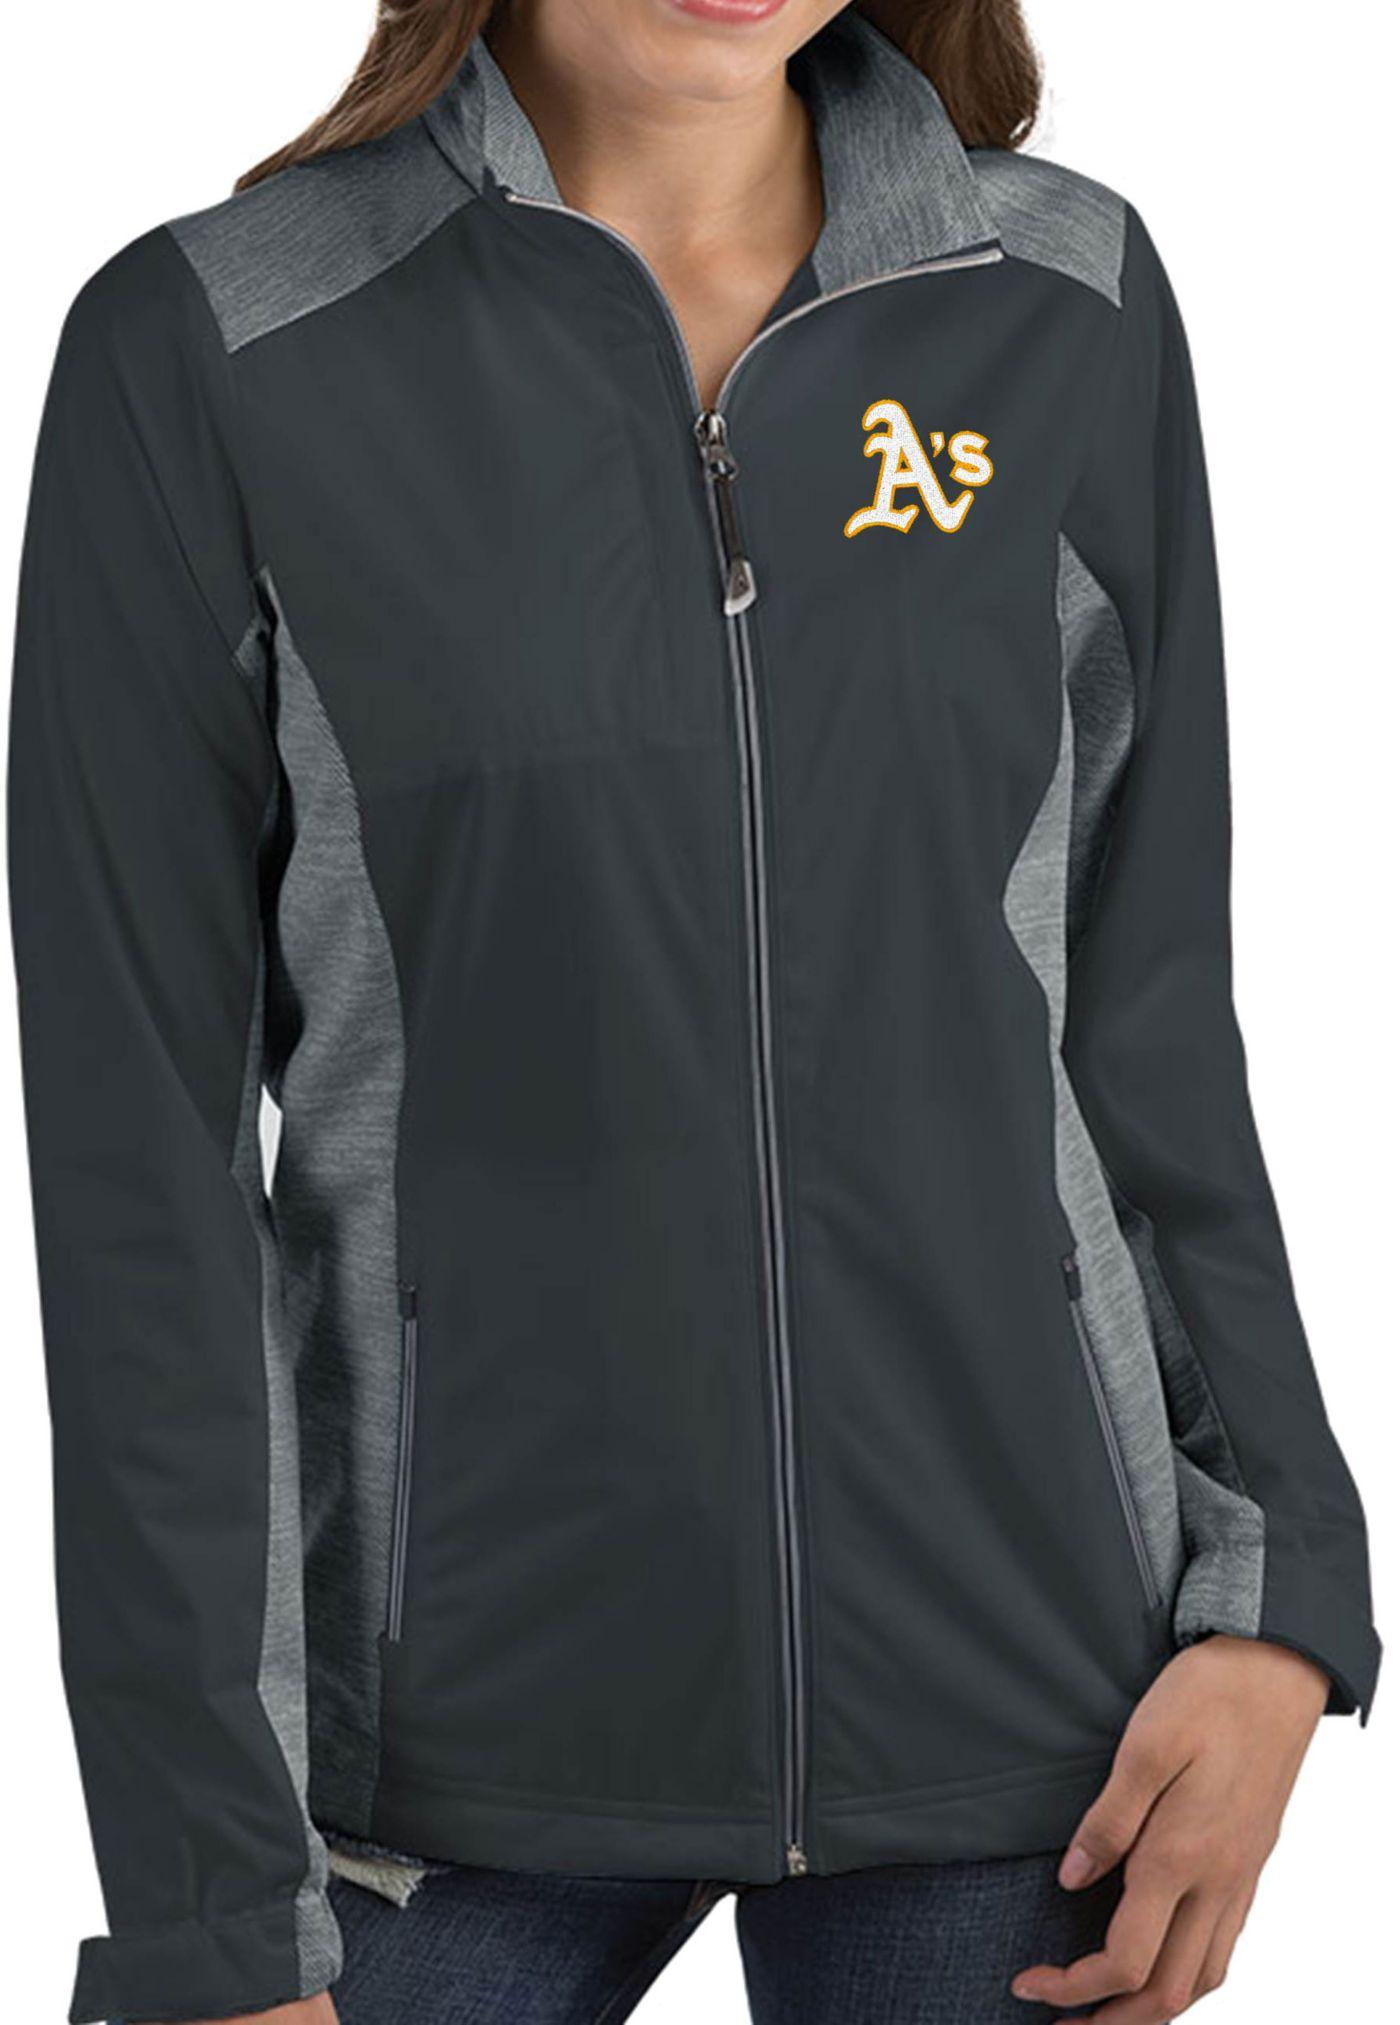 Antigua Women's Oakland Athletics Revolve Grey Full-Zip Jacket